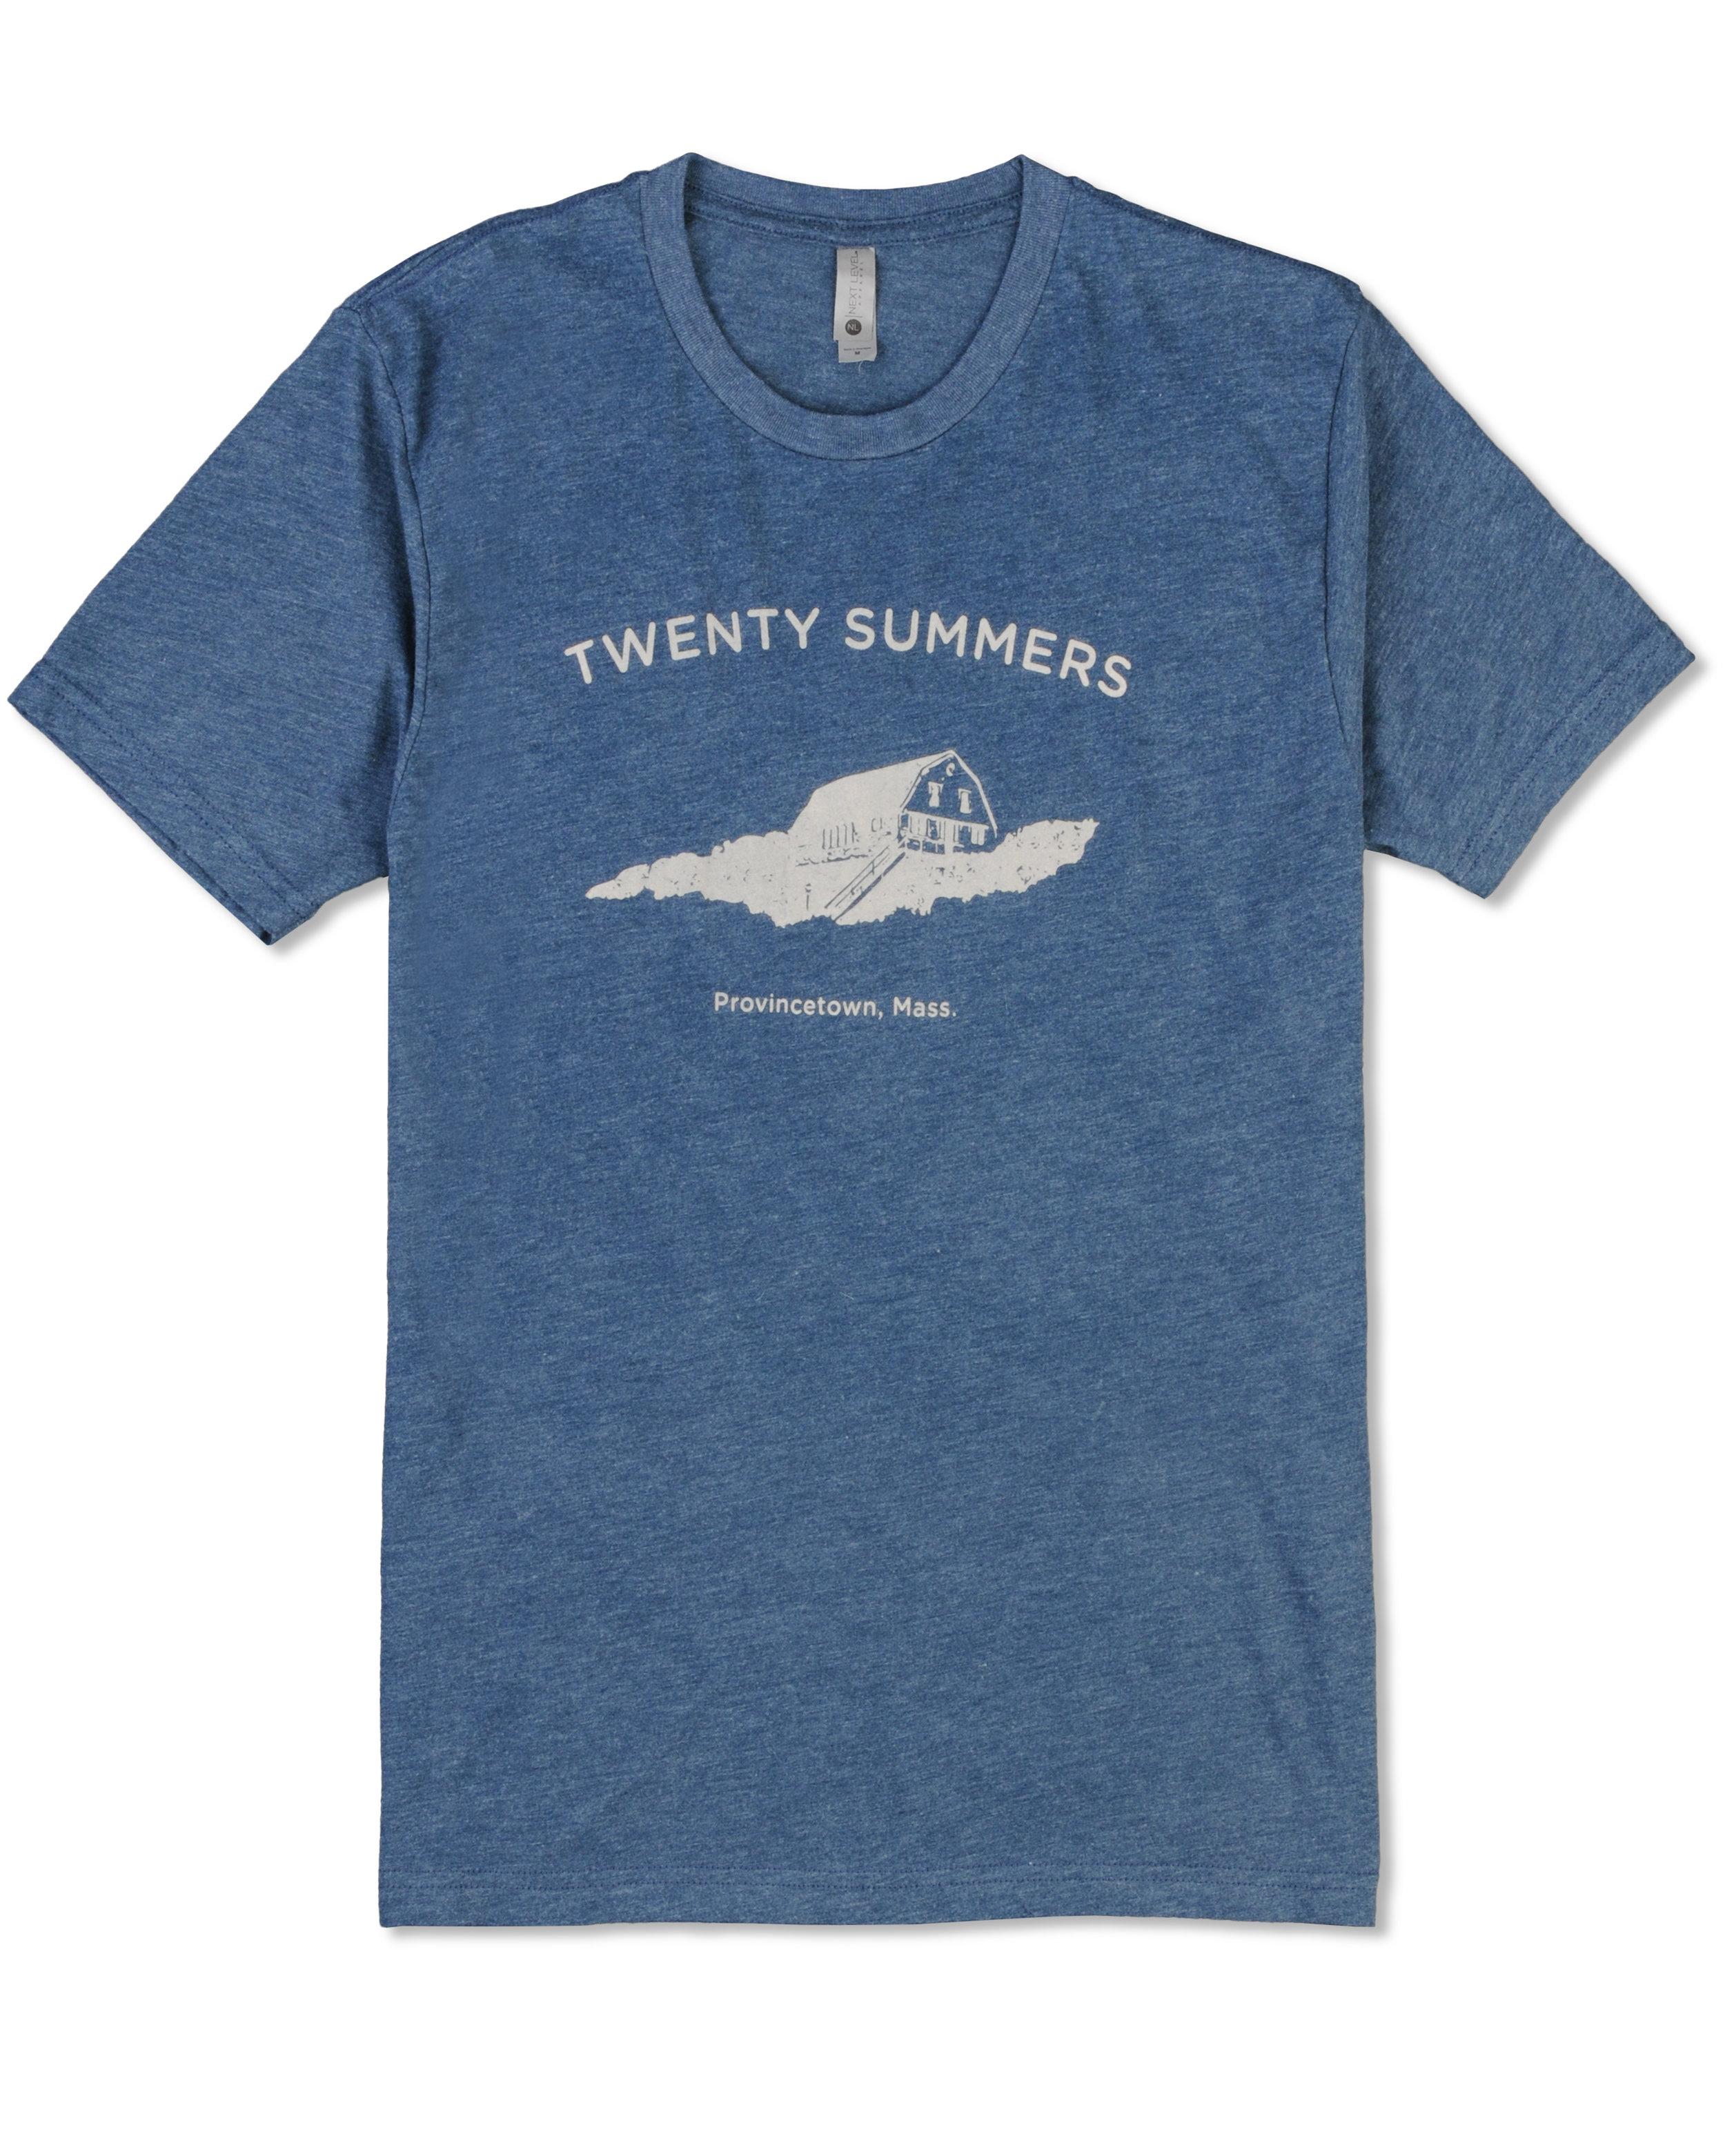 Unisex T-Shirt $25